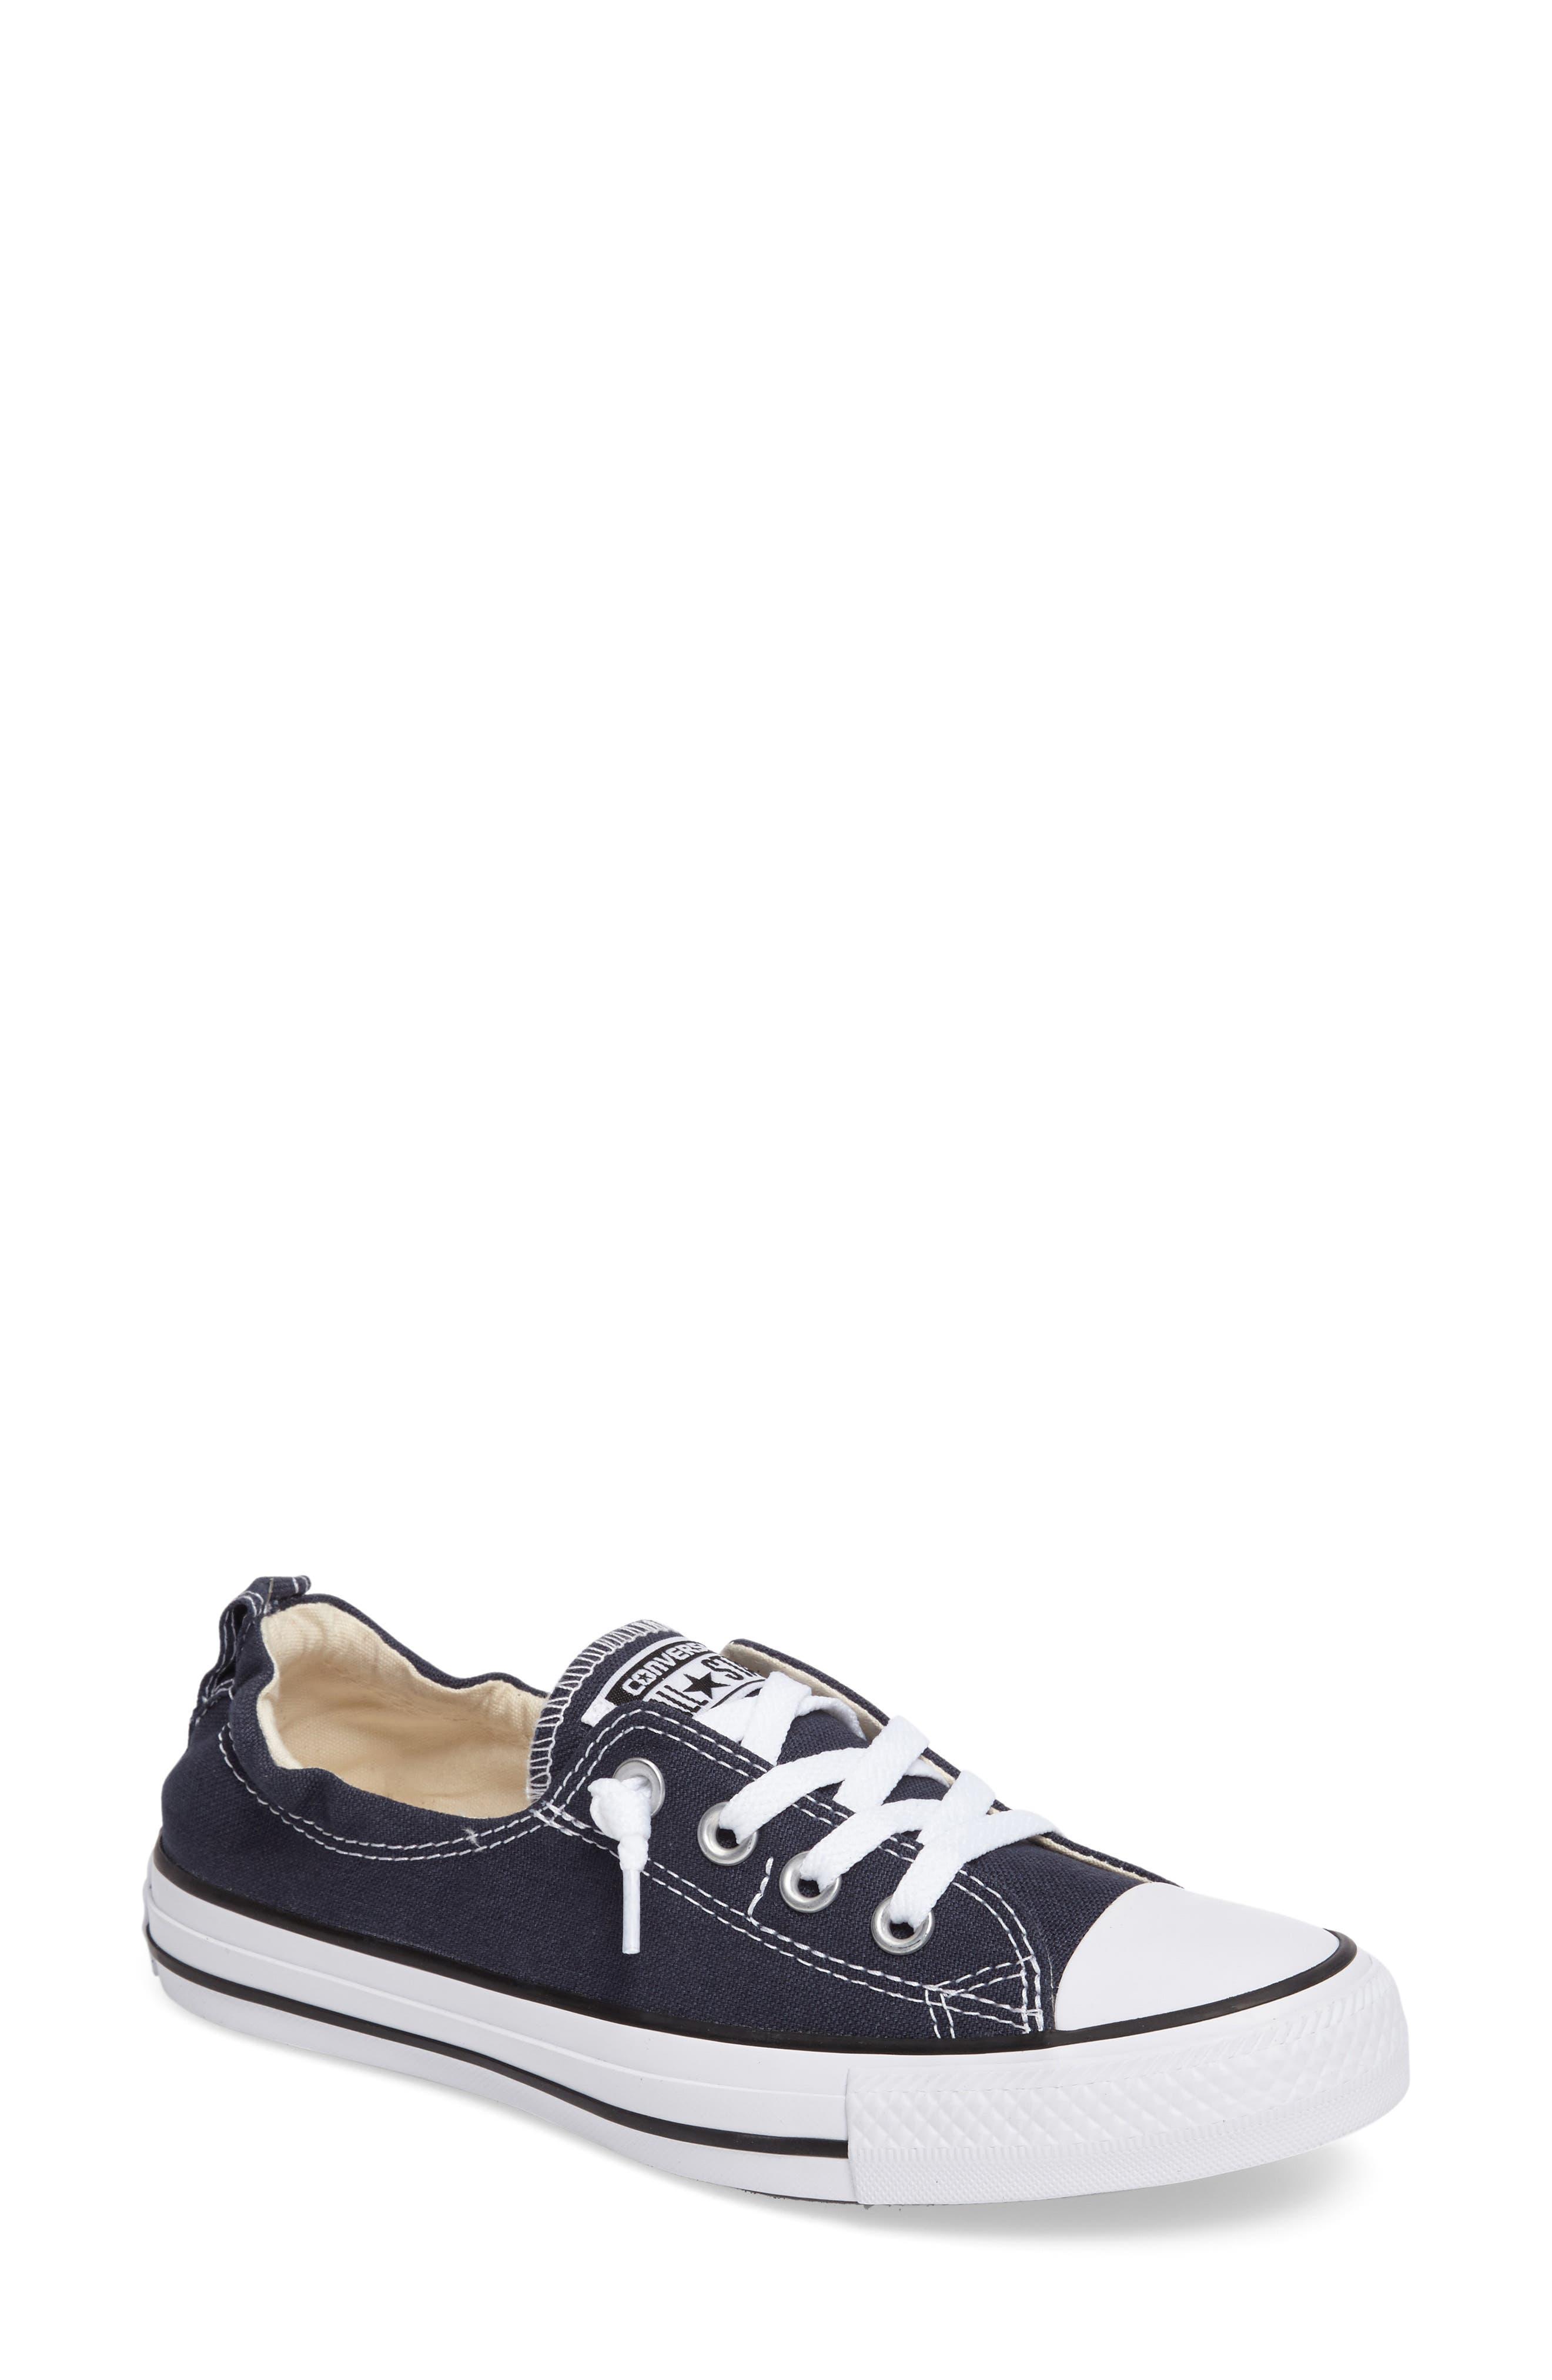 Chuck Taylor<sup>®</sup> 'Shoreline' Sneaker,                             Alternate thumbnail 2, color,                             NAVY